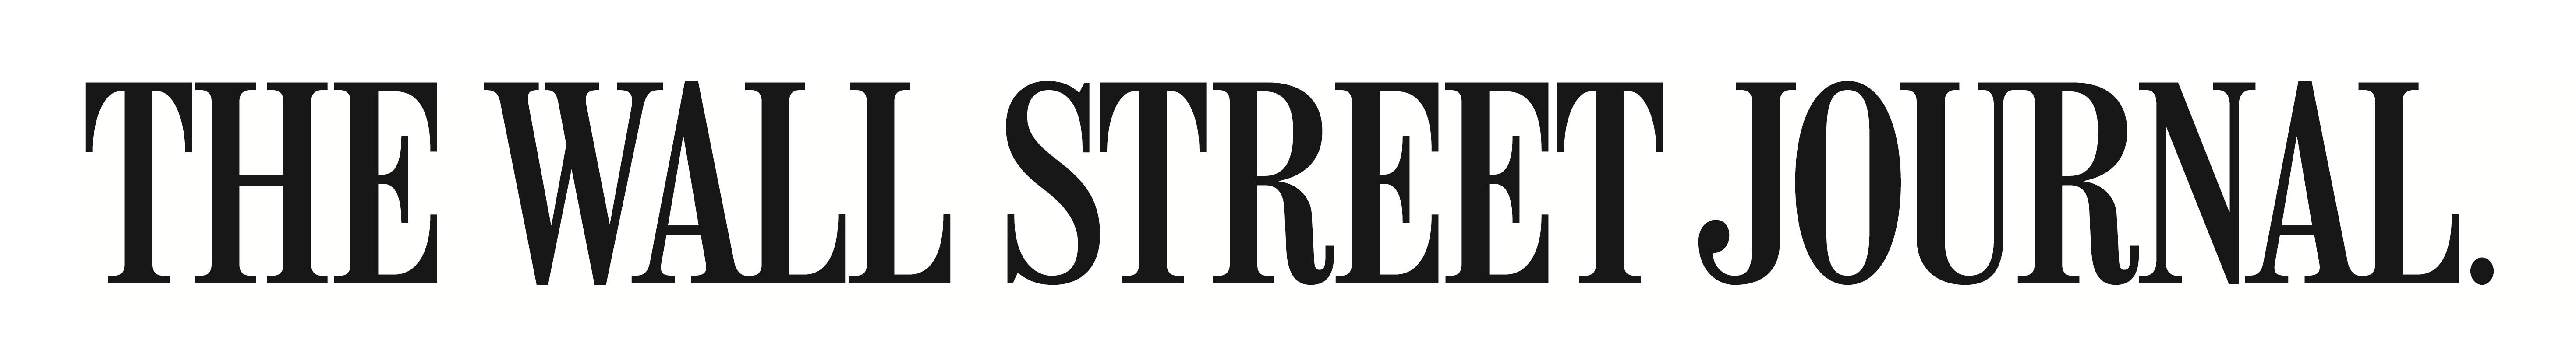 Wall Street Journal Bobbleheads